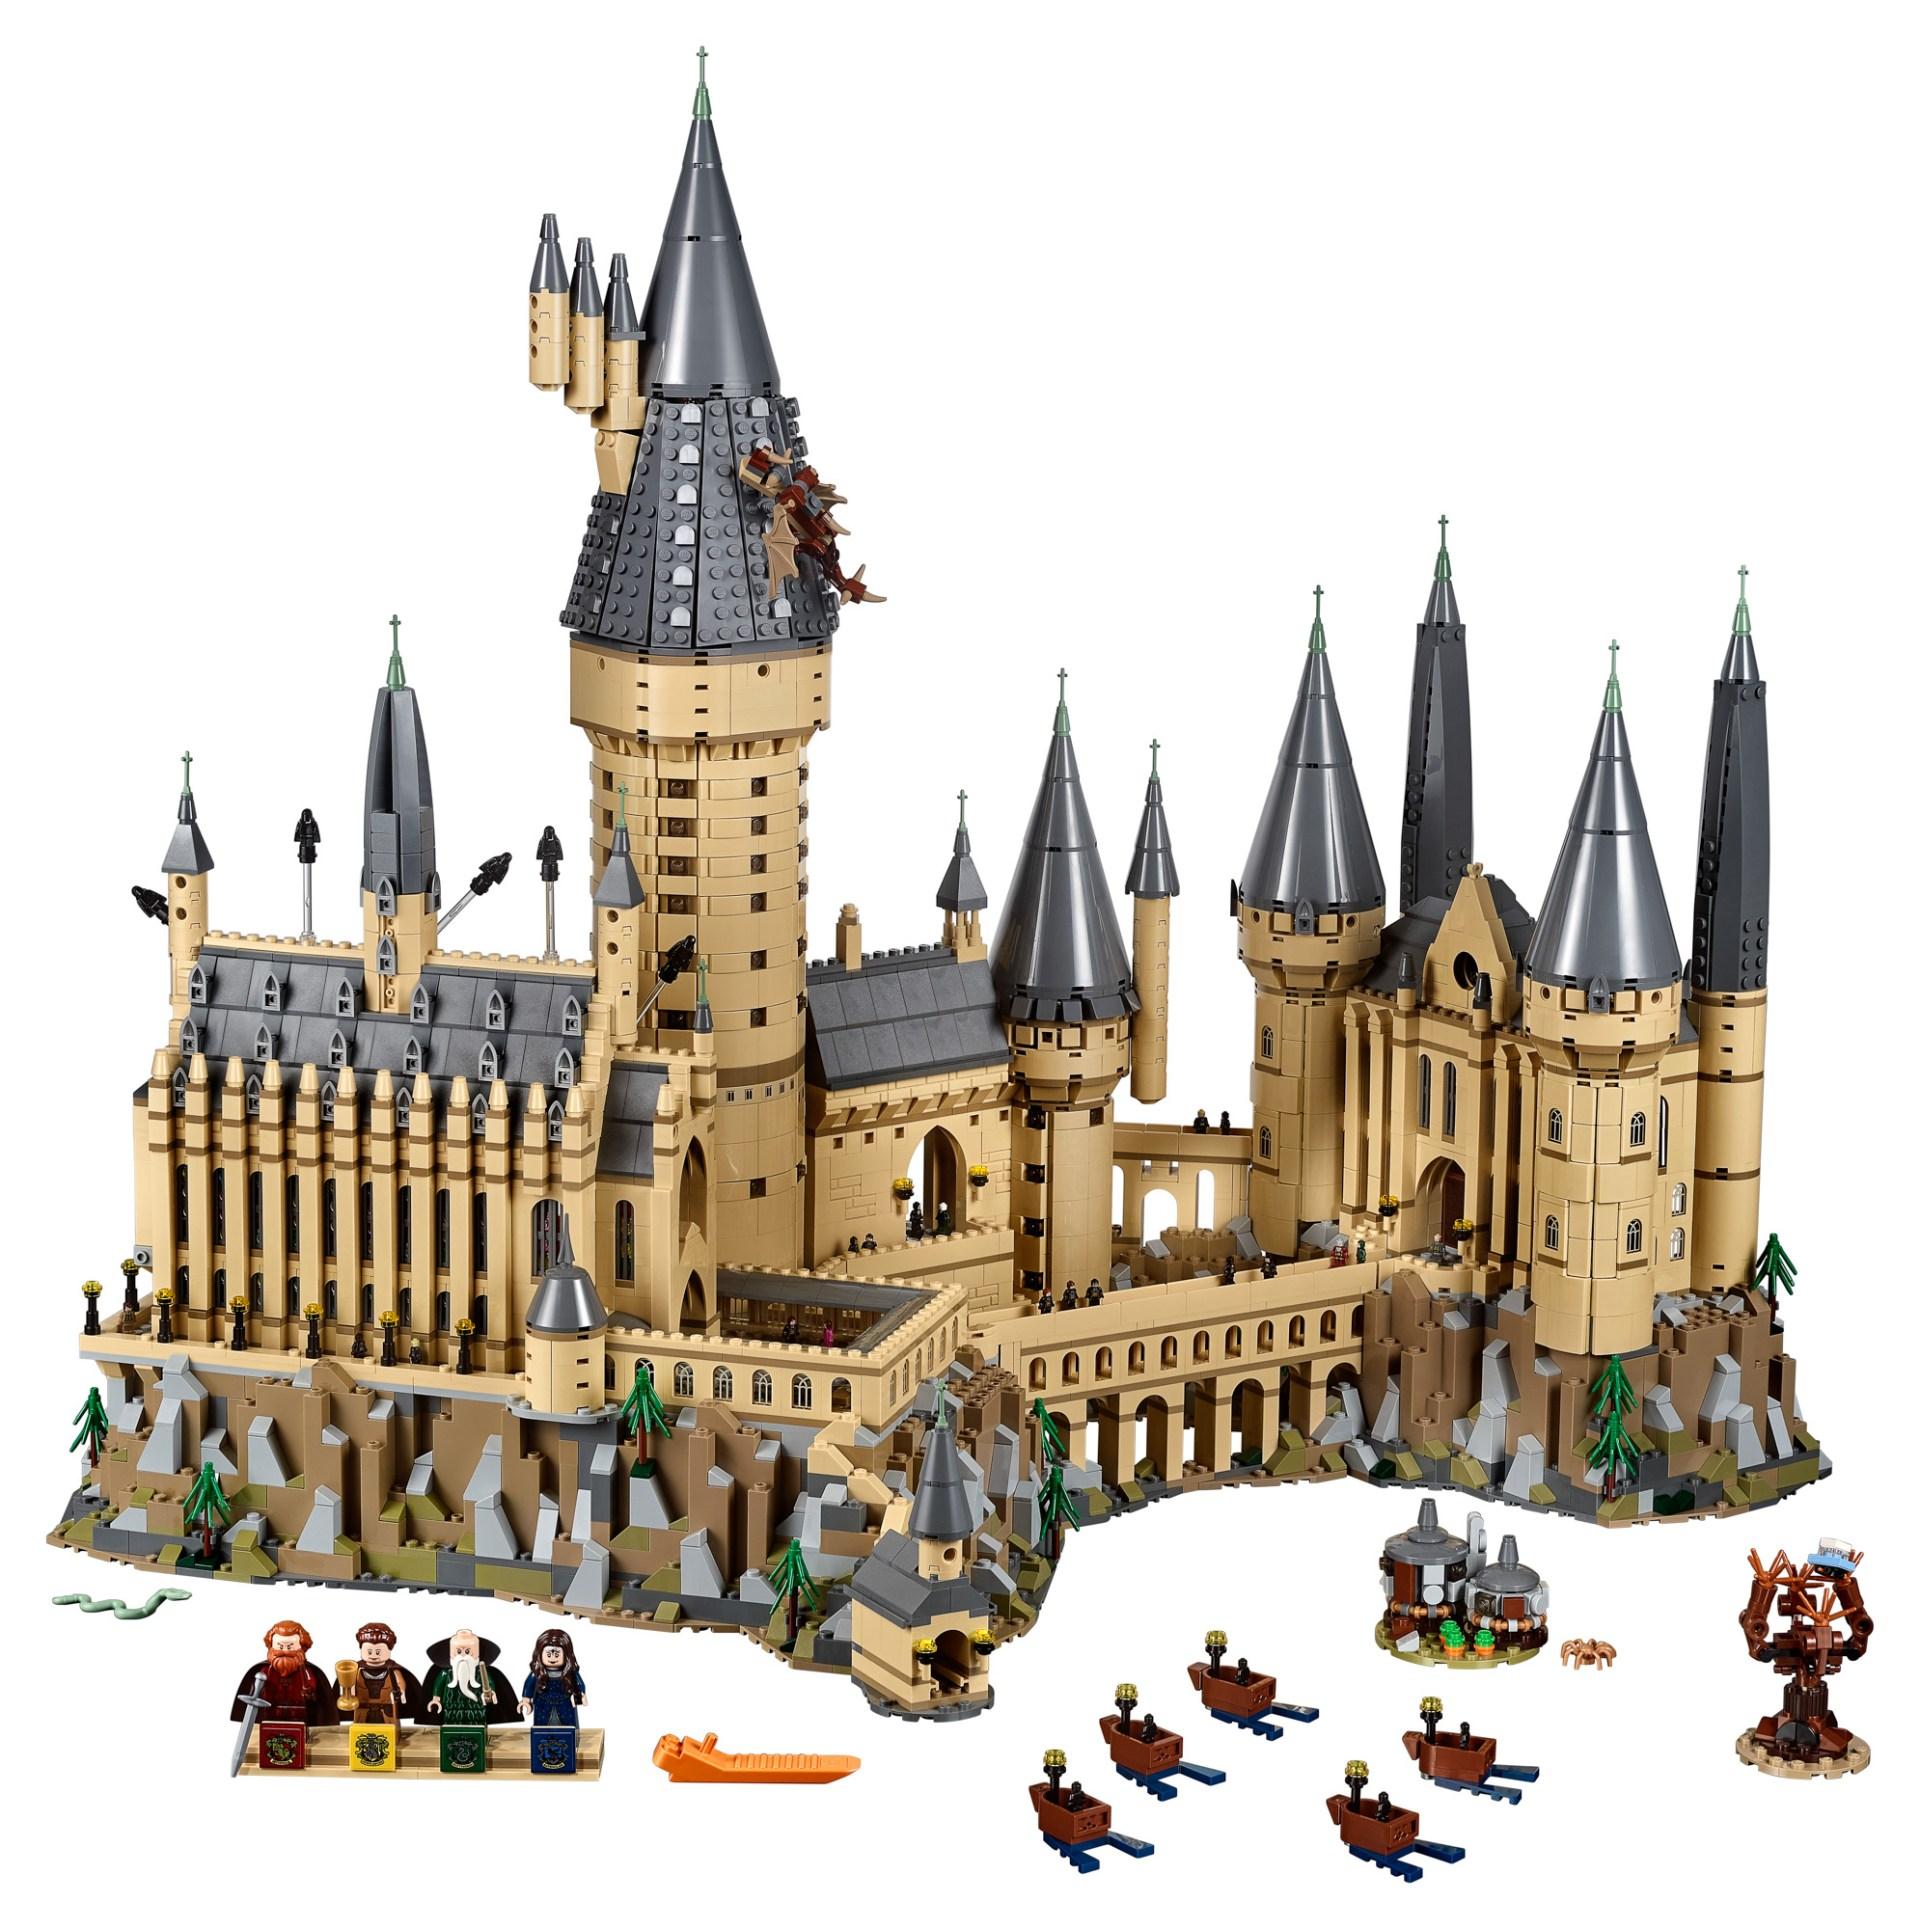 71043-Harry-Potter-Hogwarts-Castle-22.jpg